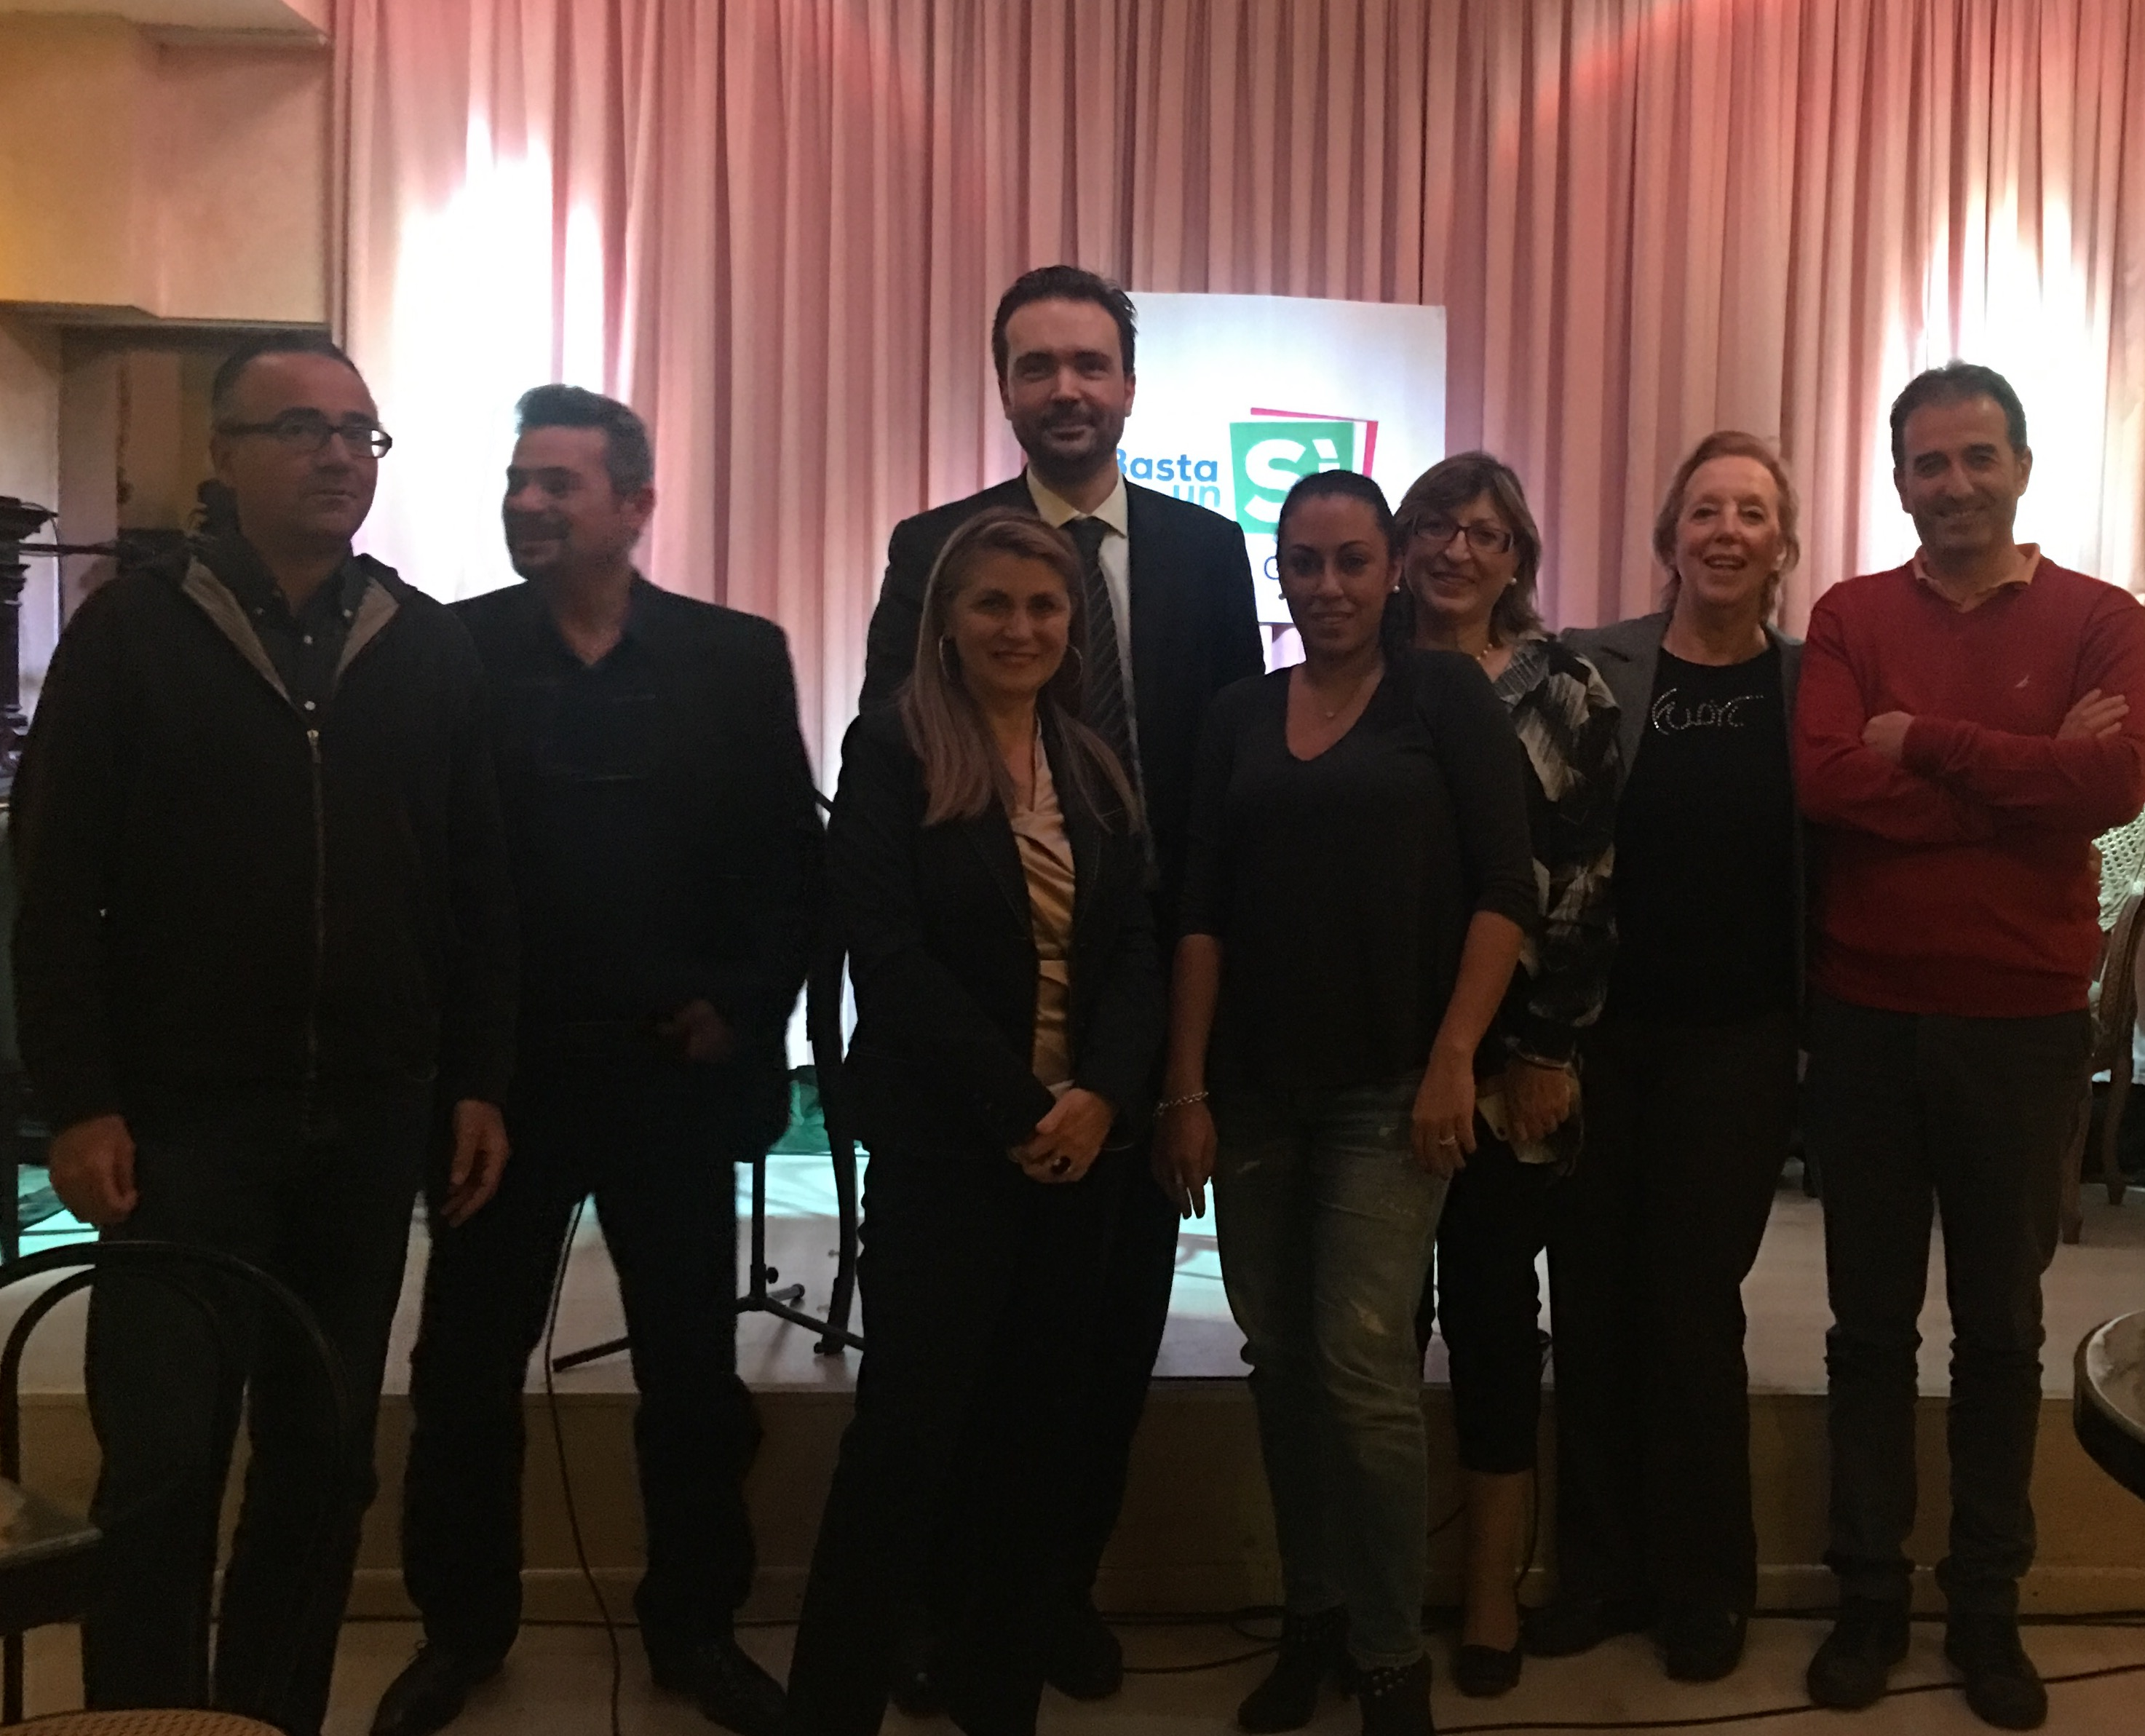 Incontro su referendum riforma costituzionale - Atene